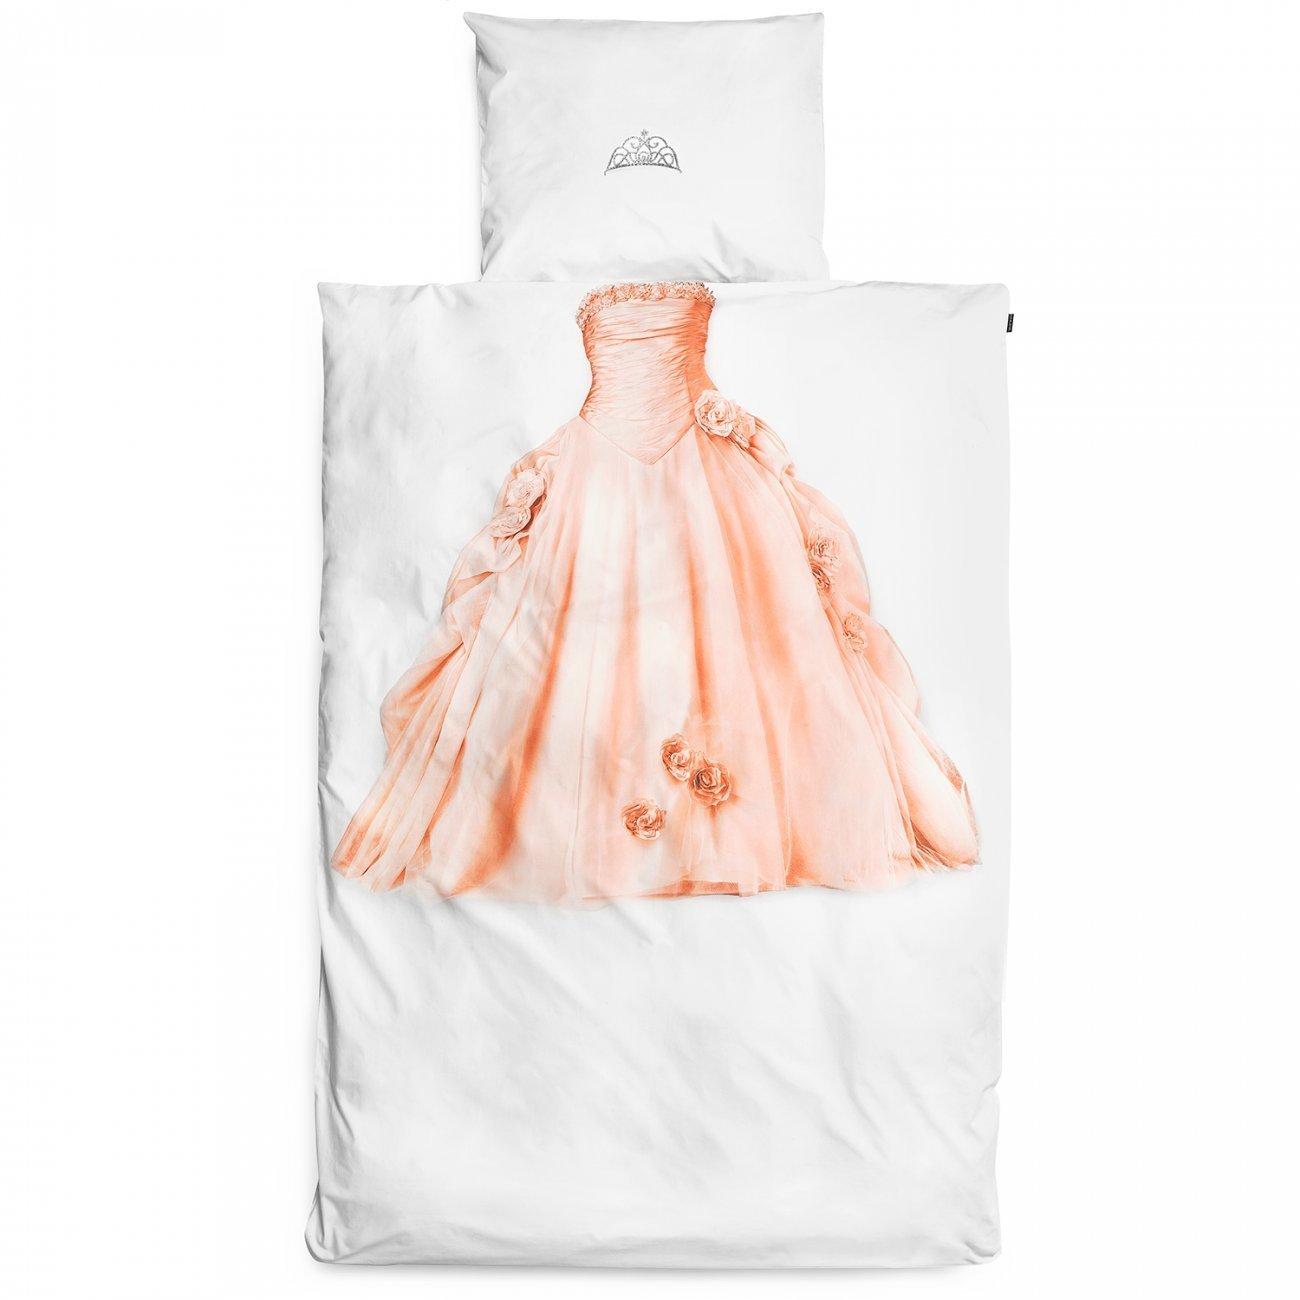 SNURK sengetøj, Prinsesse, 140x200 cm